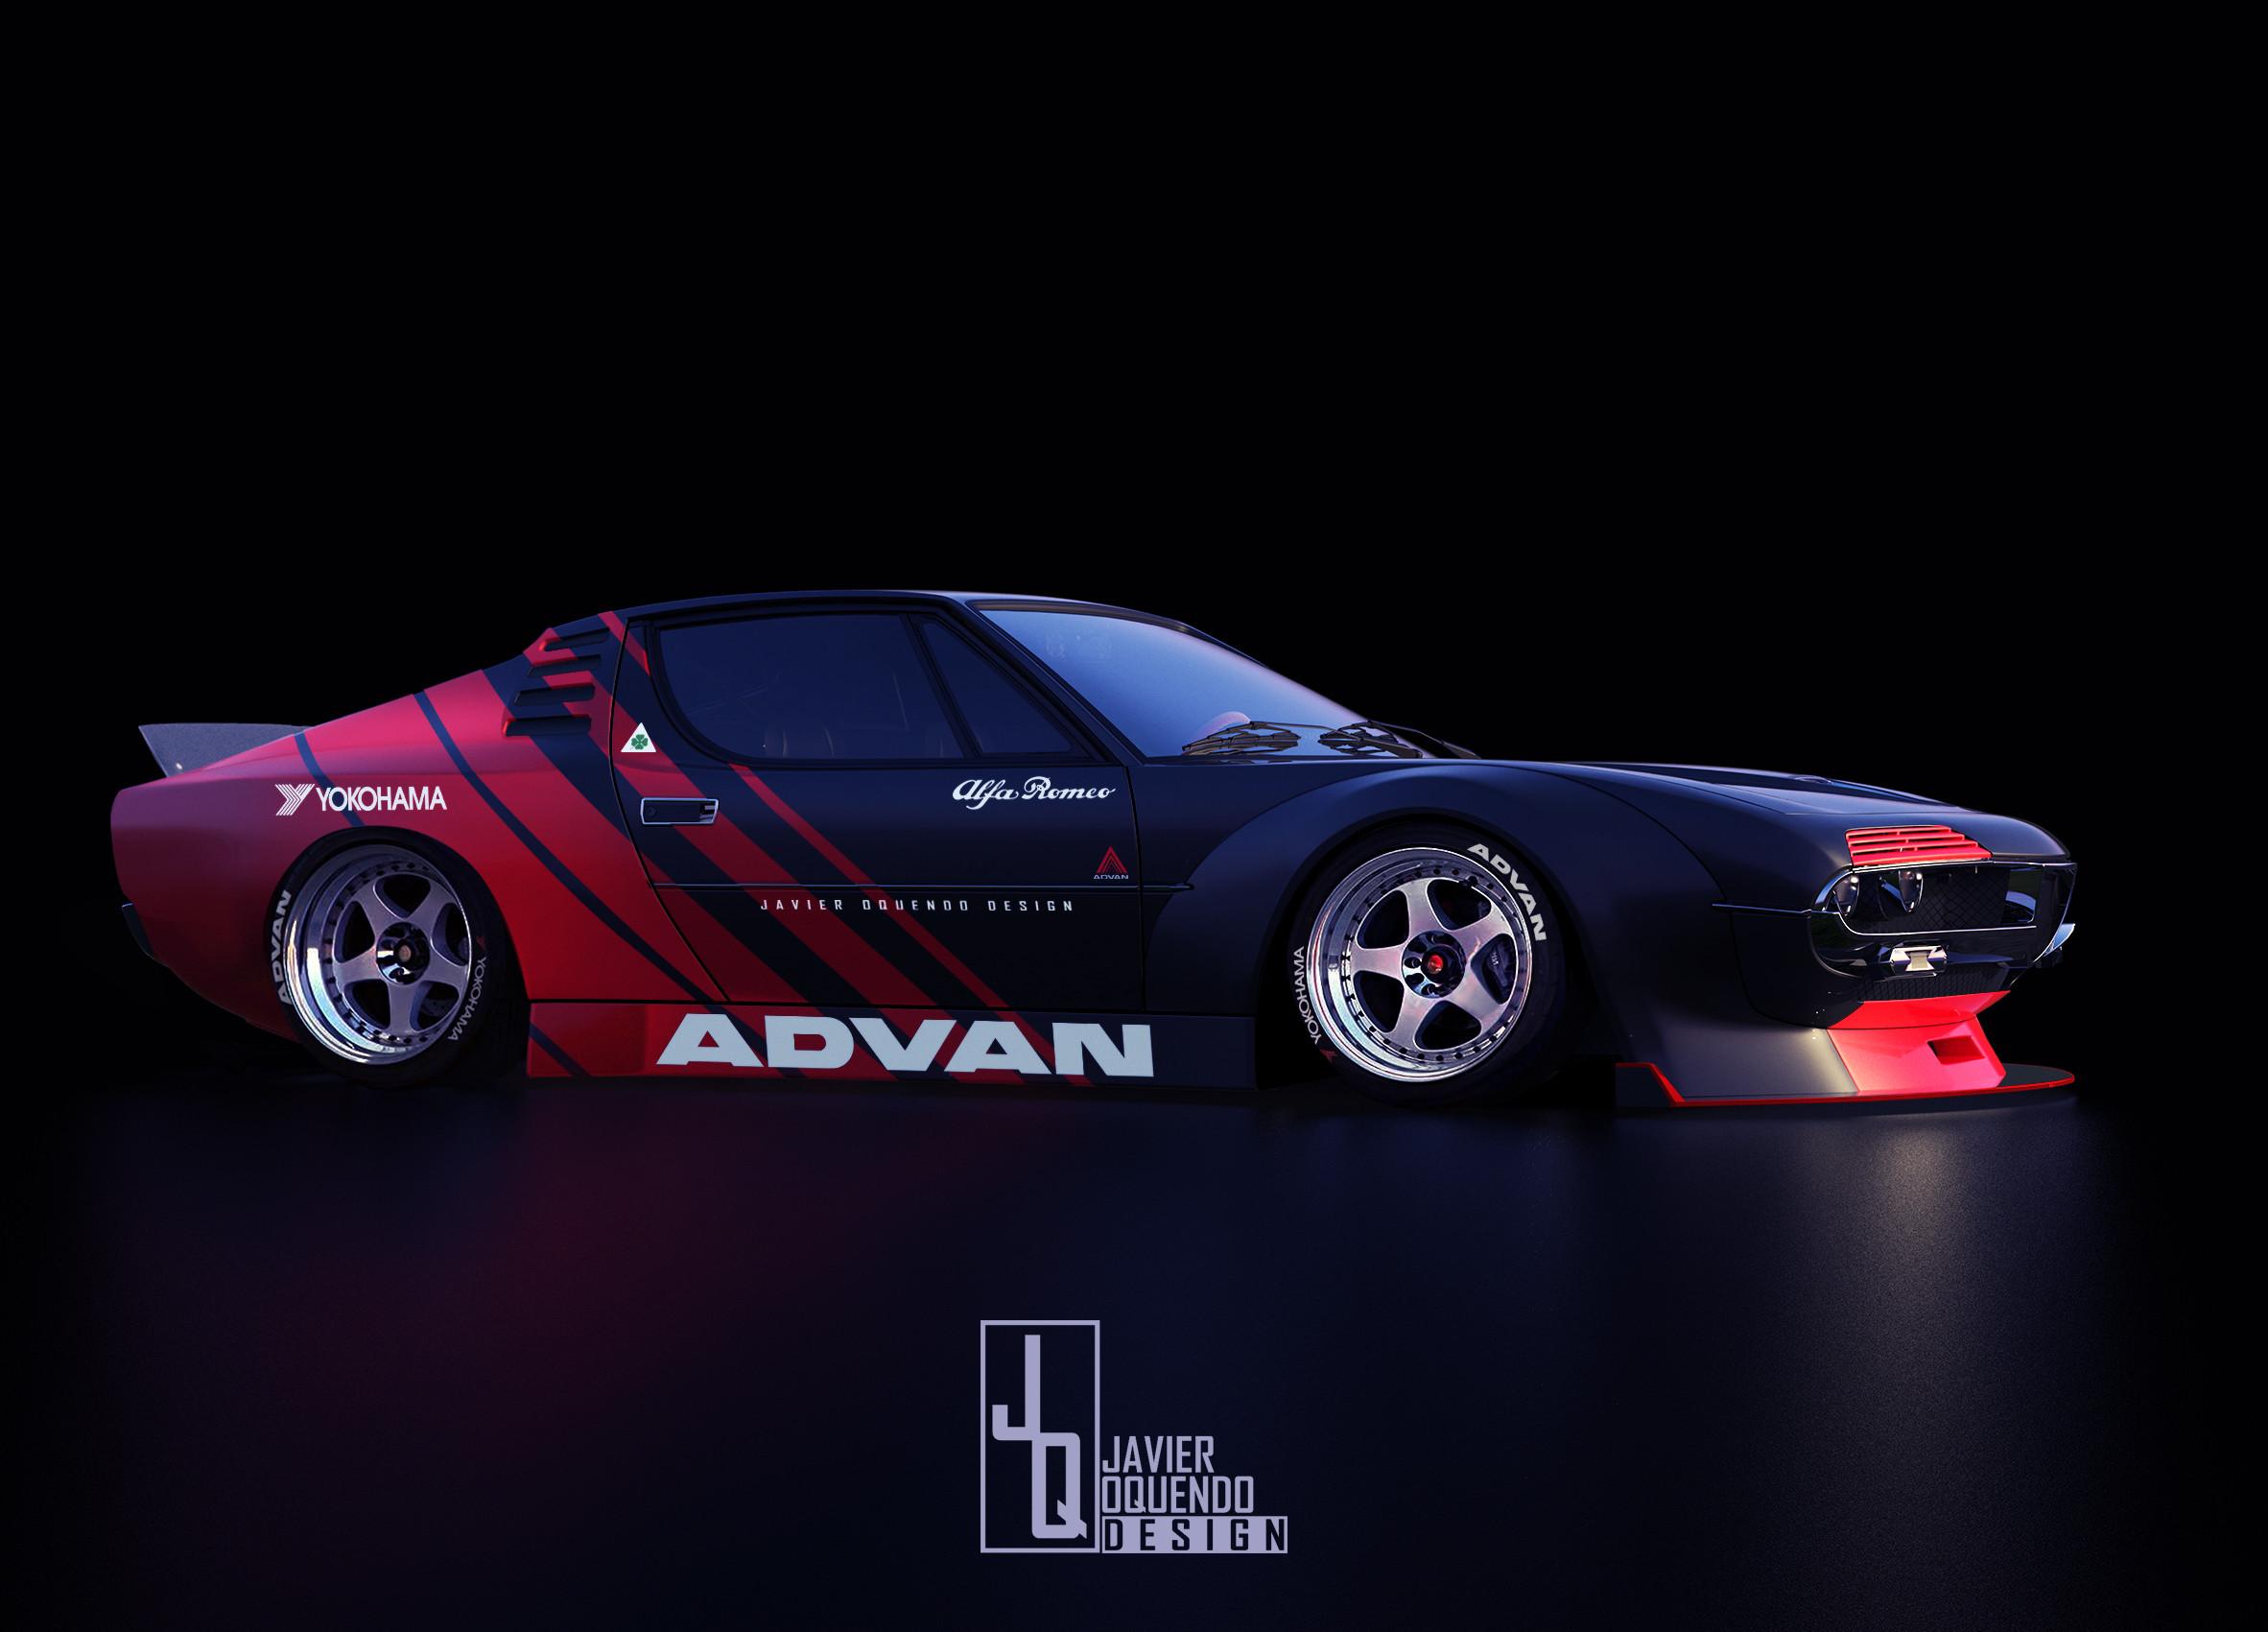 Advan Livery